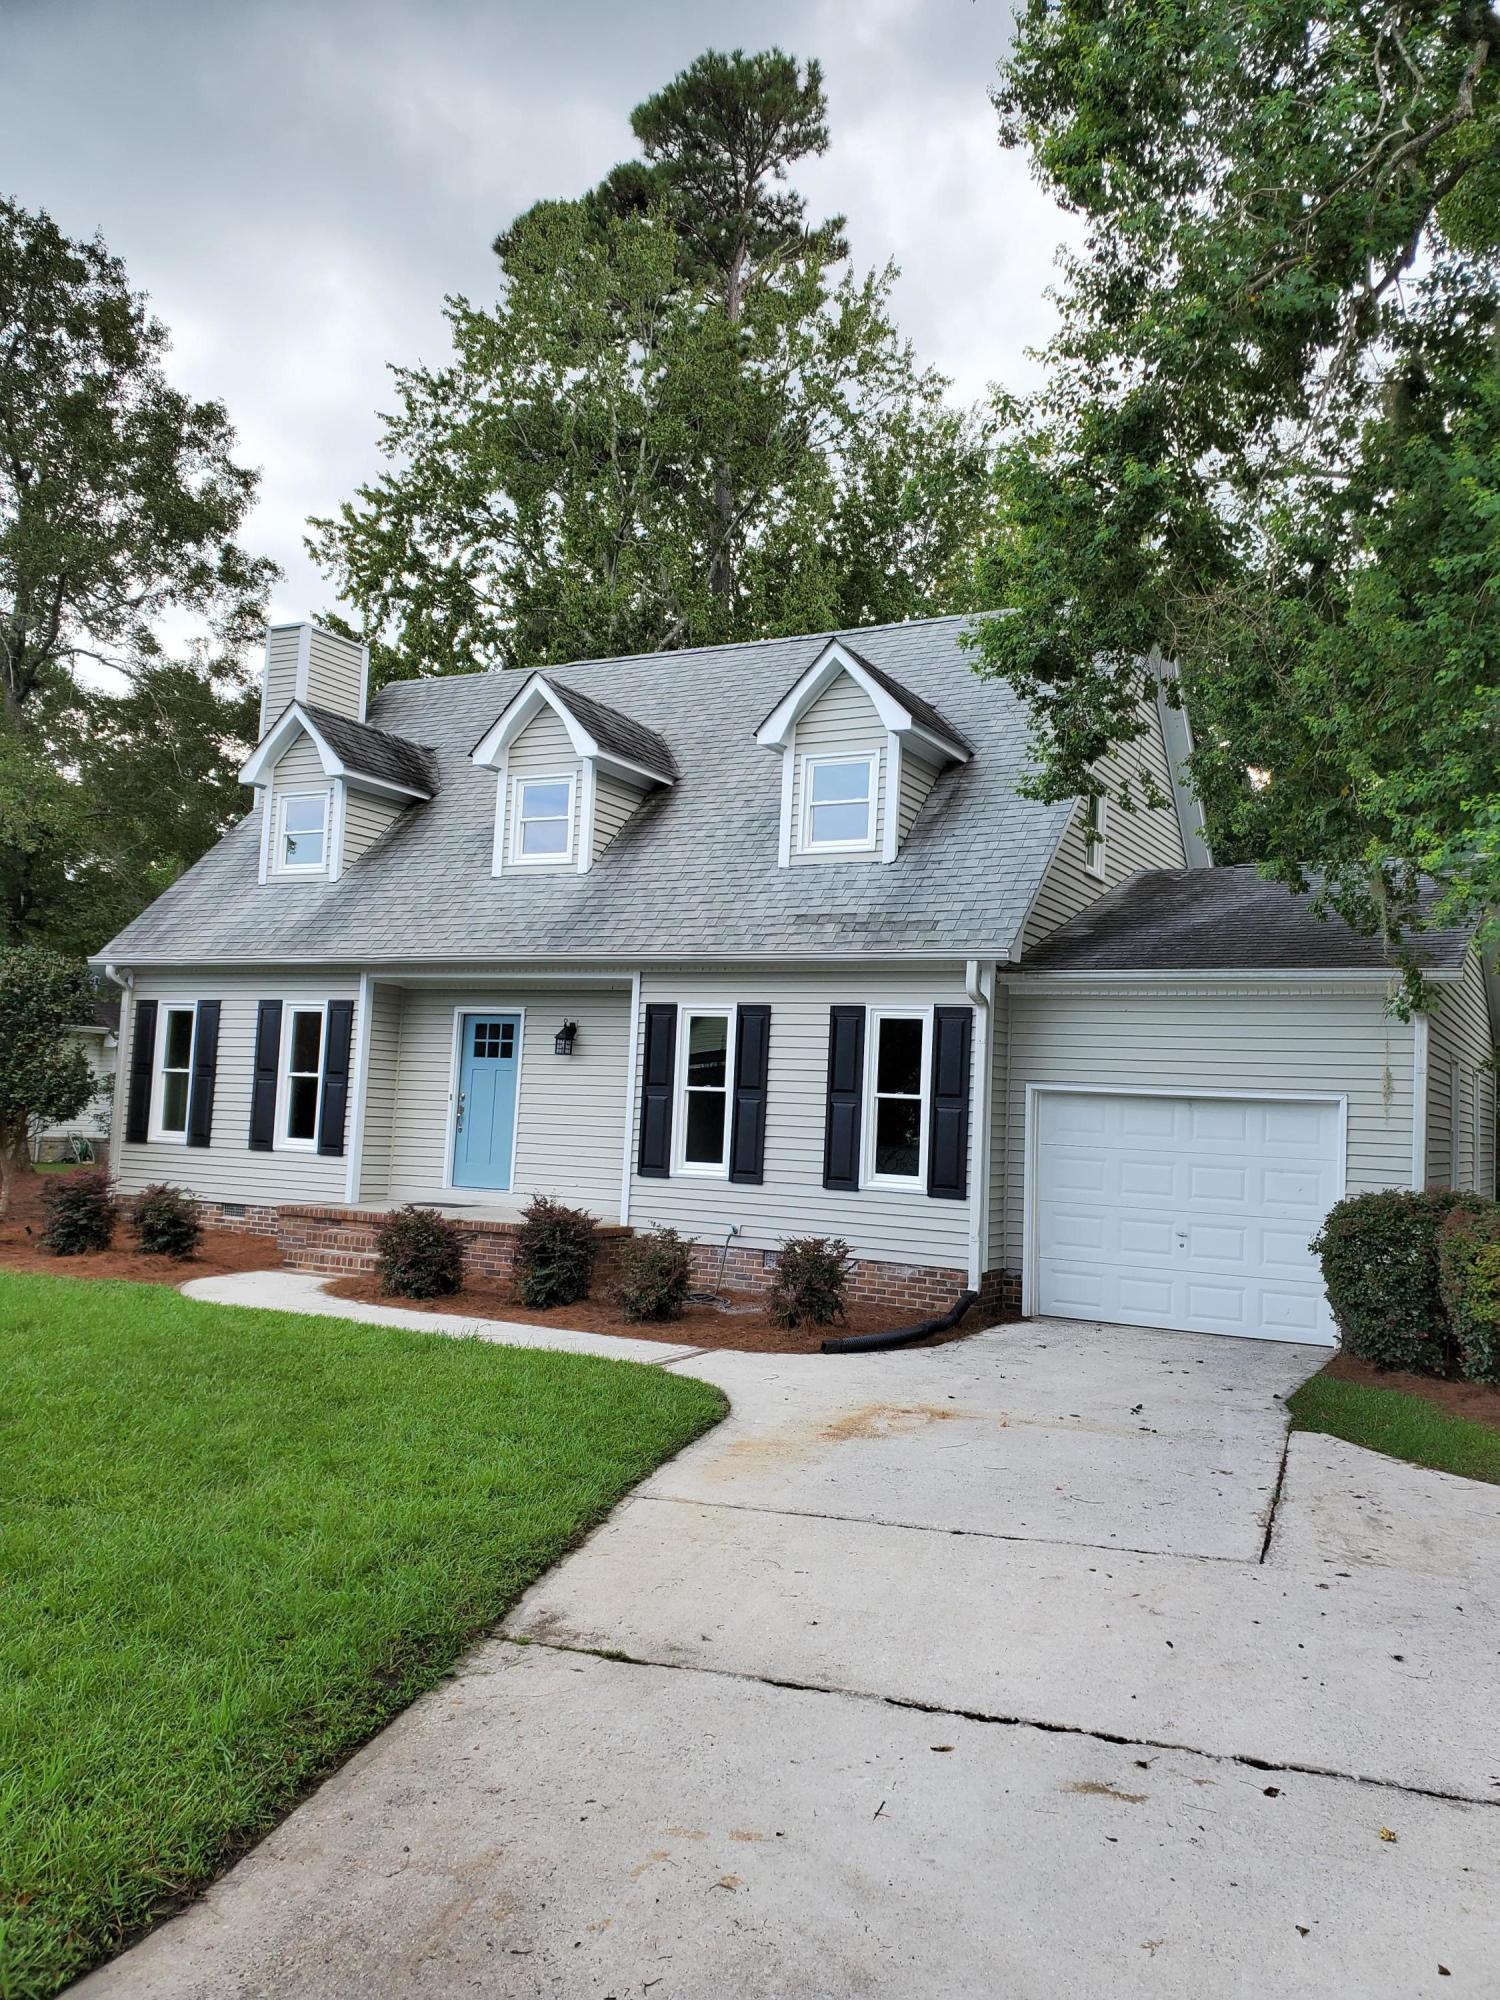 Wedgewood Homes For Sale - 87 William Screvens, Georgetown, SC - 1